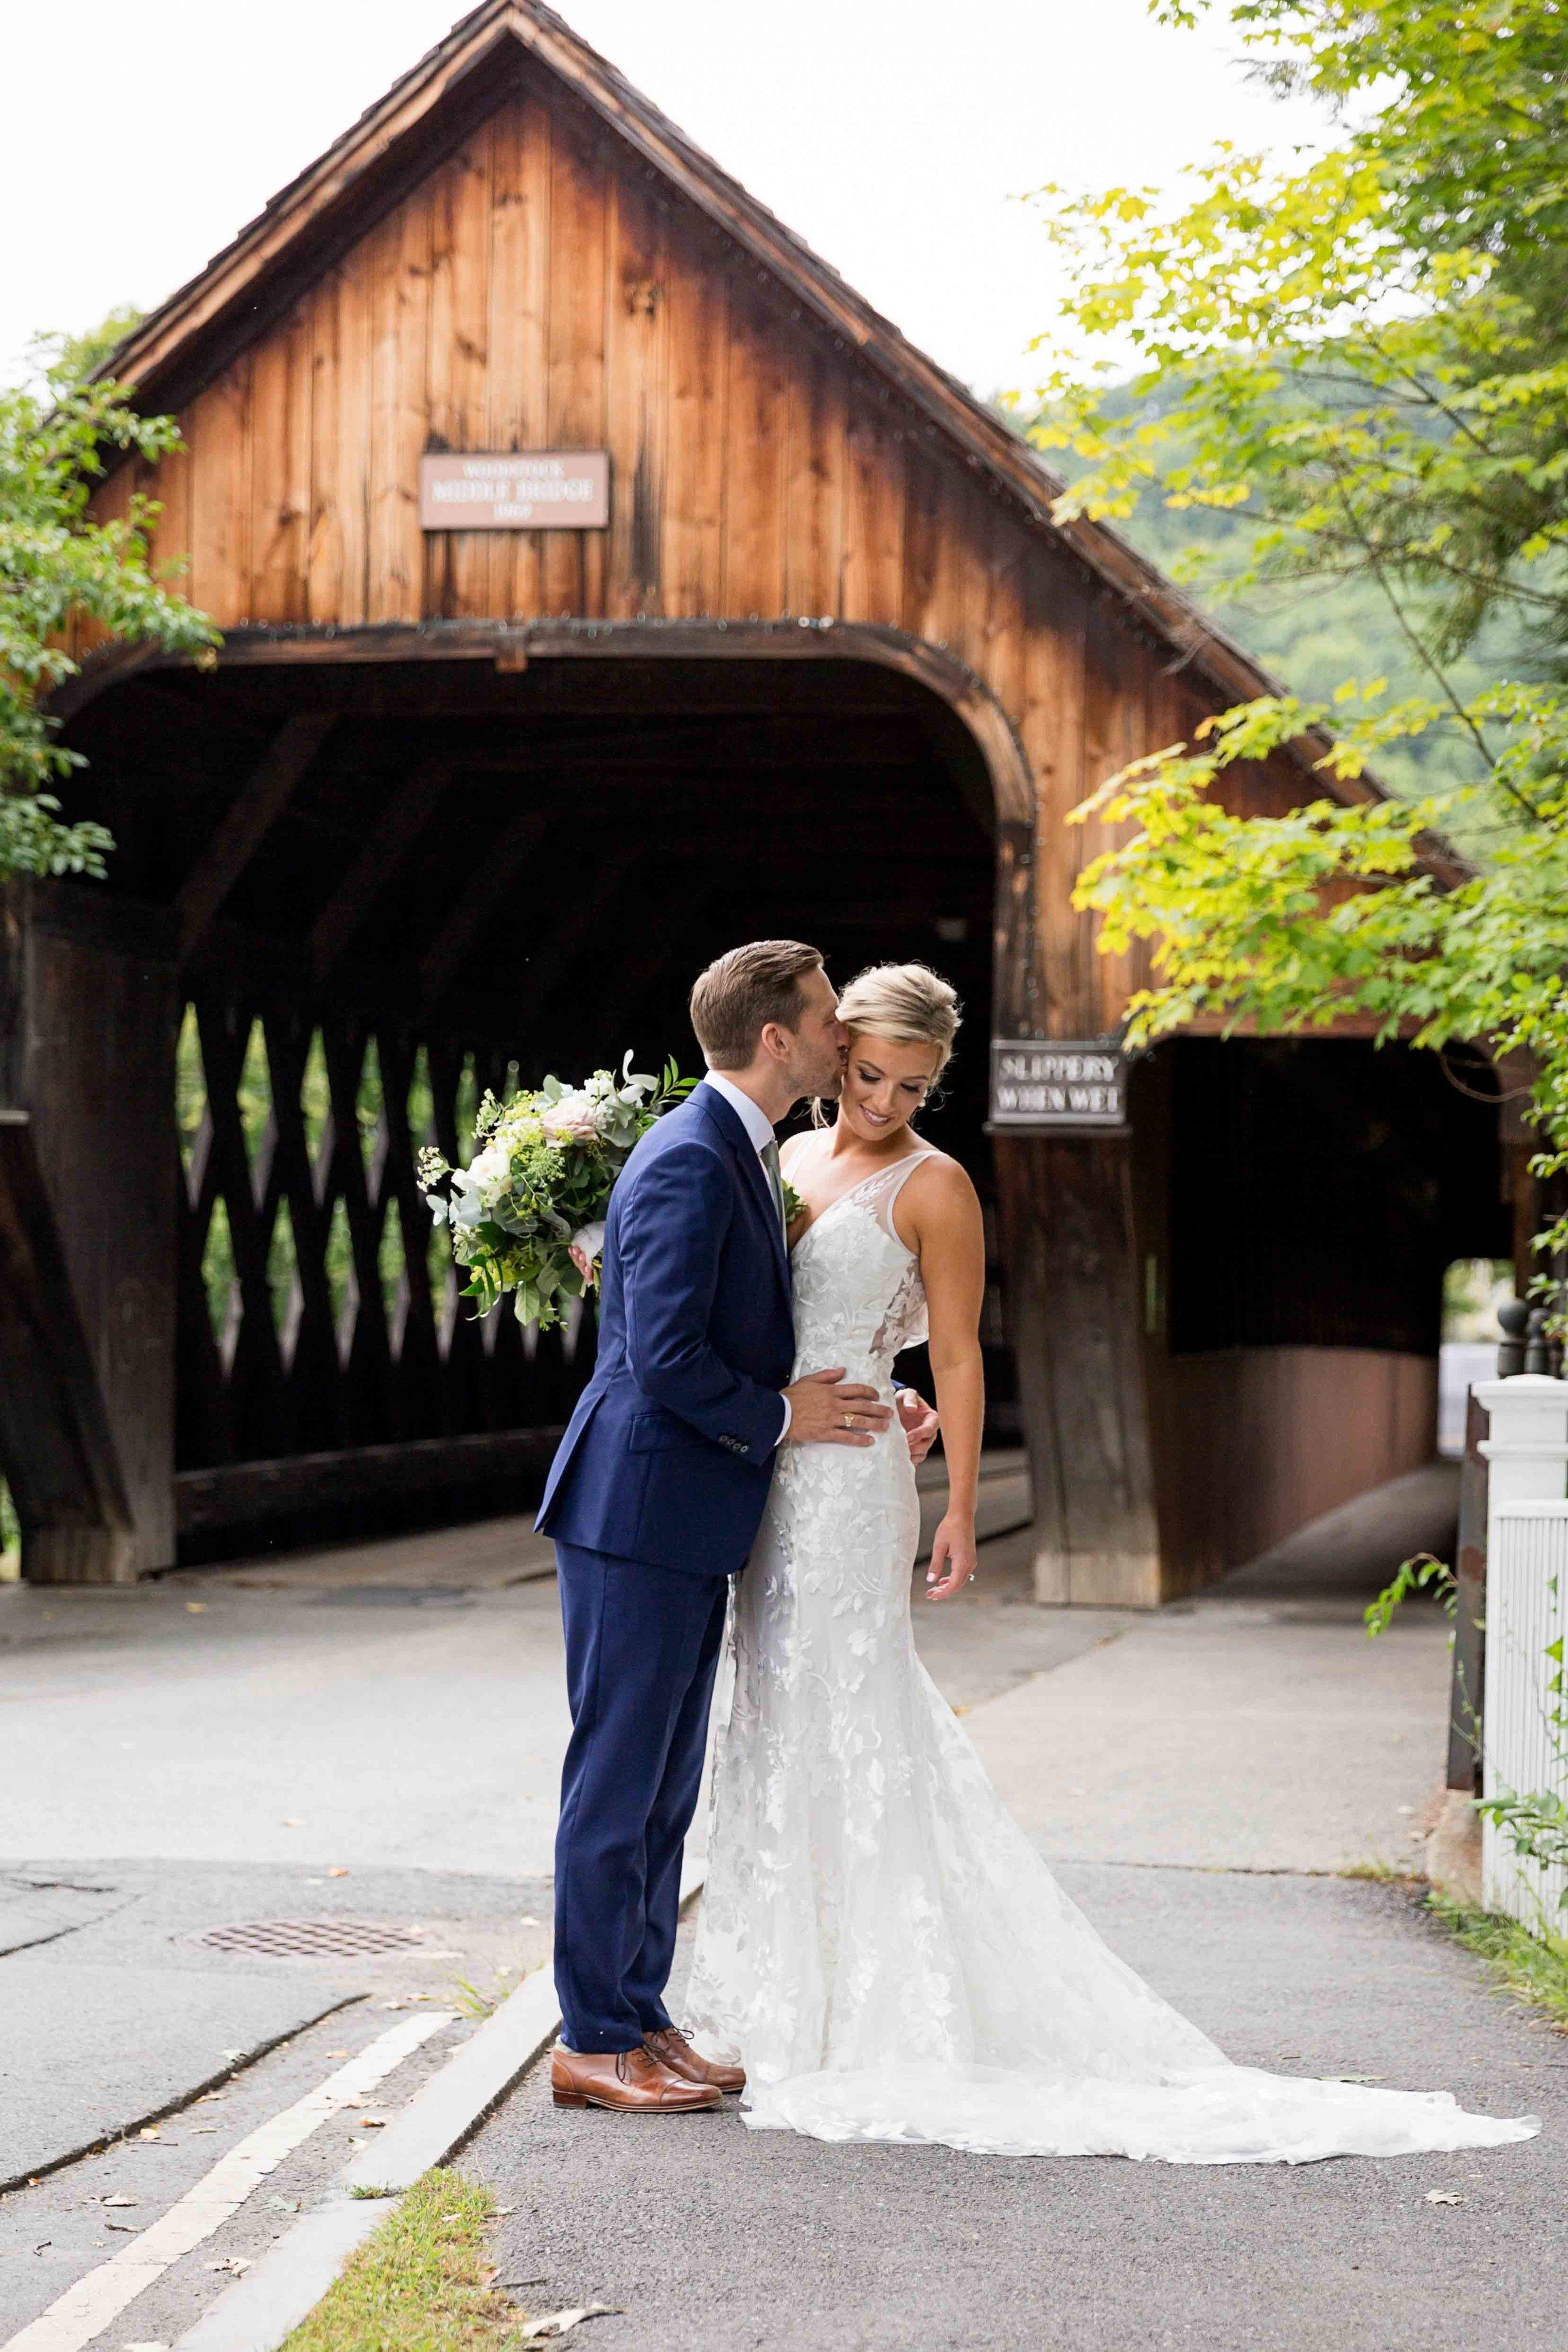 Covered Bridge Wedding Portrait in Woodstock VT from The Woodstock Inn and Resort